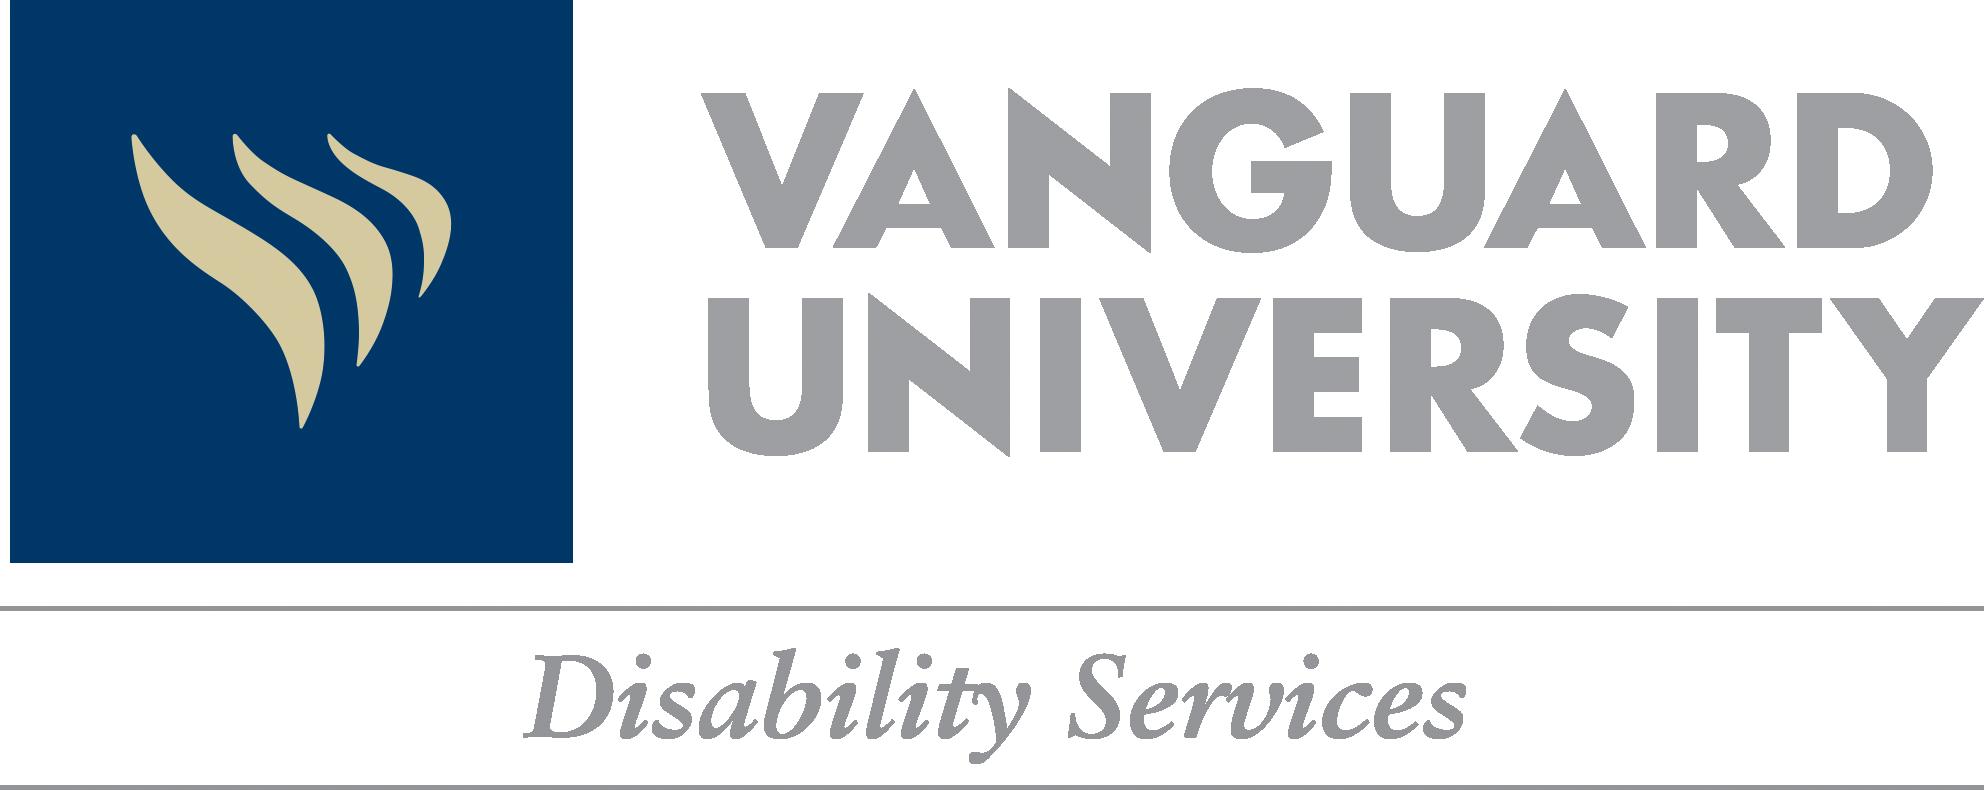 Disability Services Vanguard University